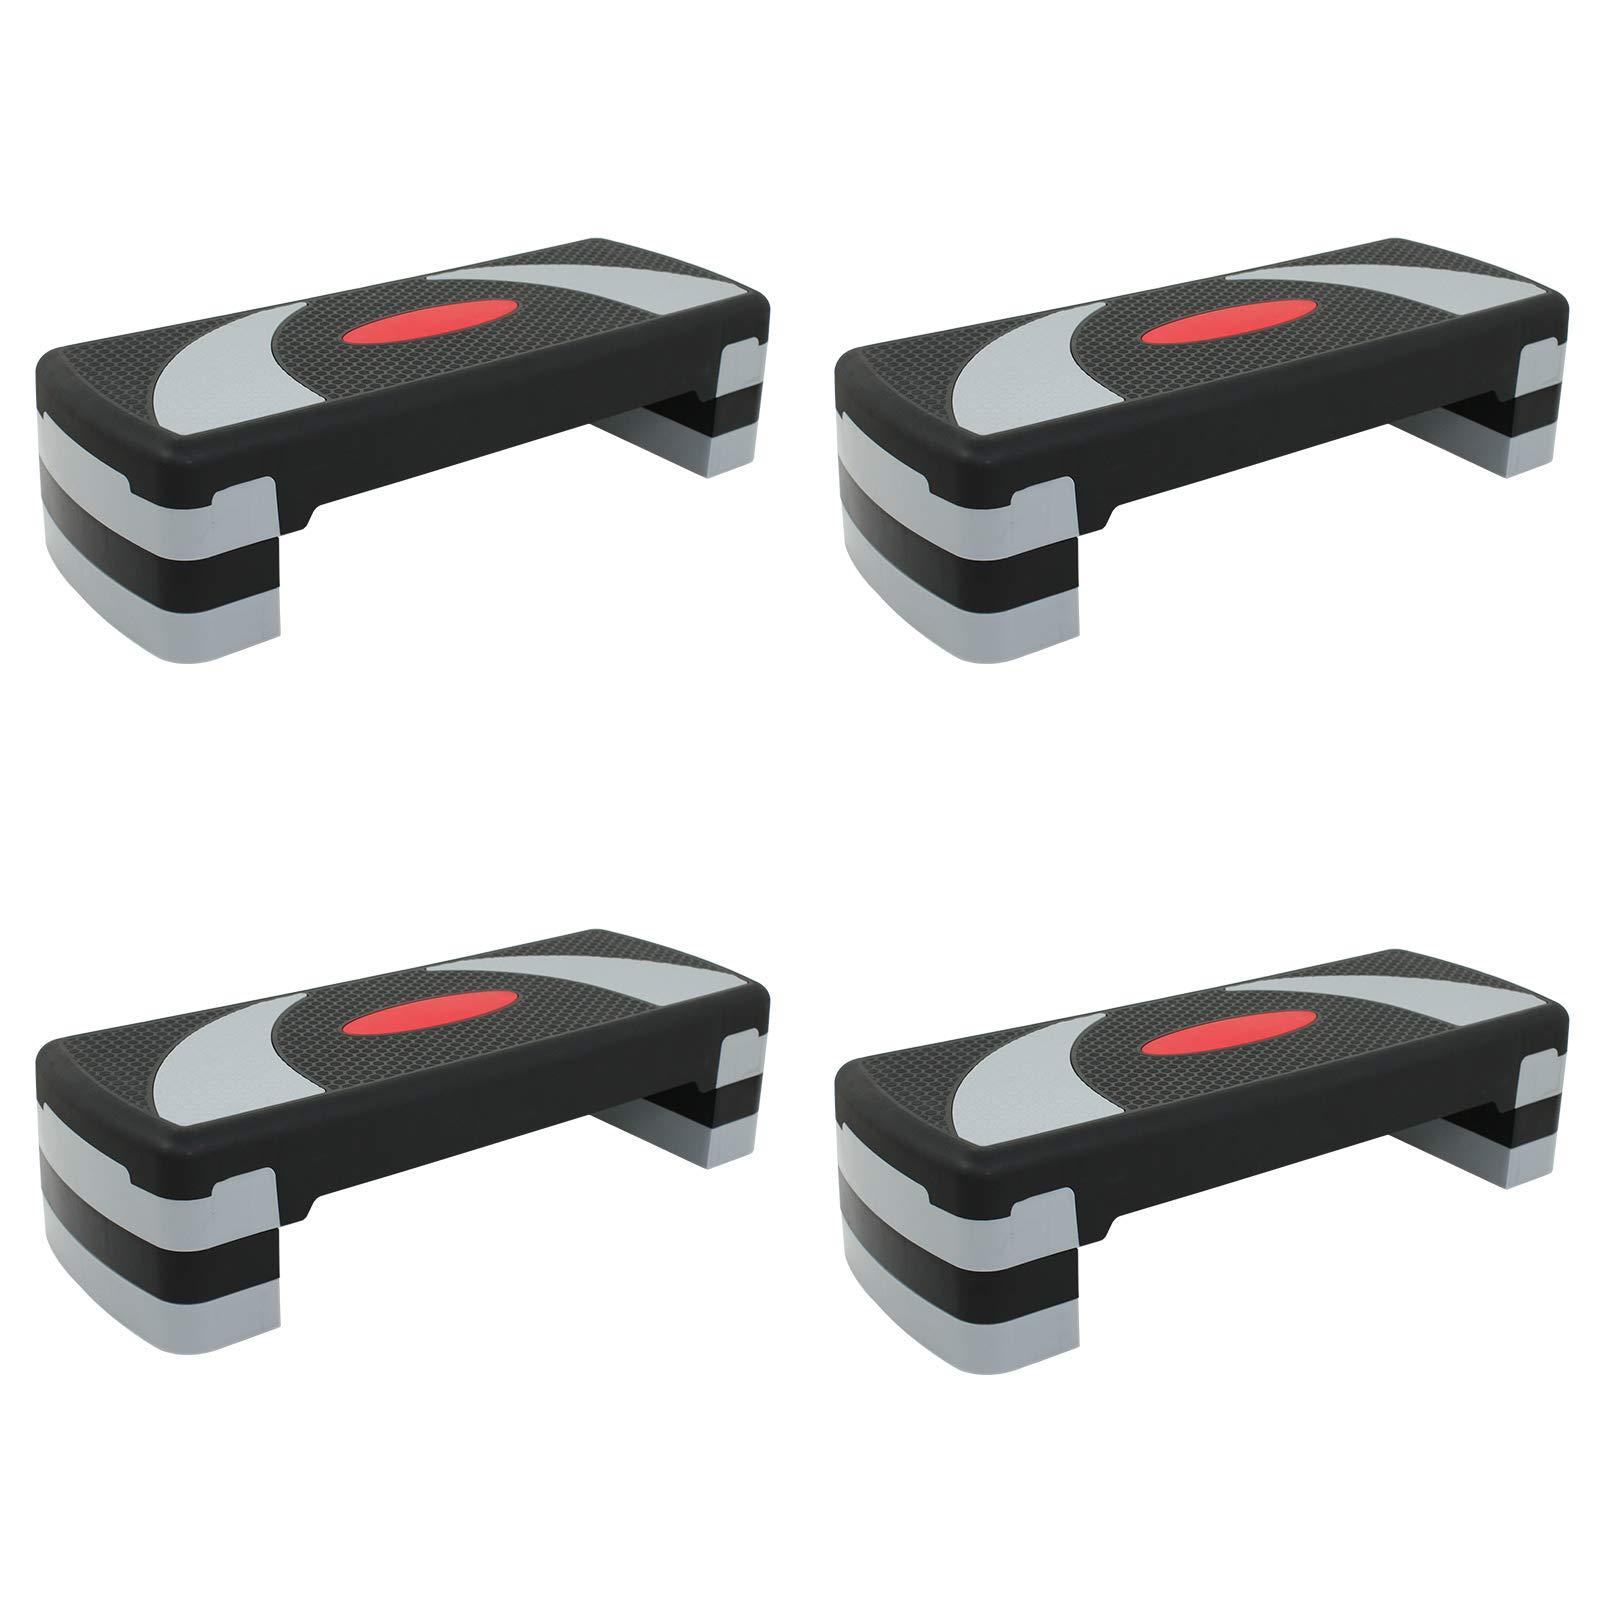 ZENY 30'' Aerobic Step Aerobics Trainer Adjustable Exercise Fitness Workout Stepper Adjust 4'' - 6'' - 8'' (Set of 4)